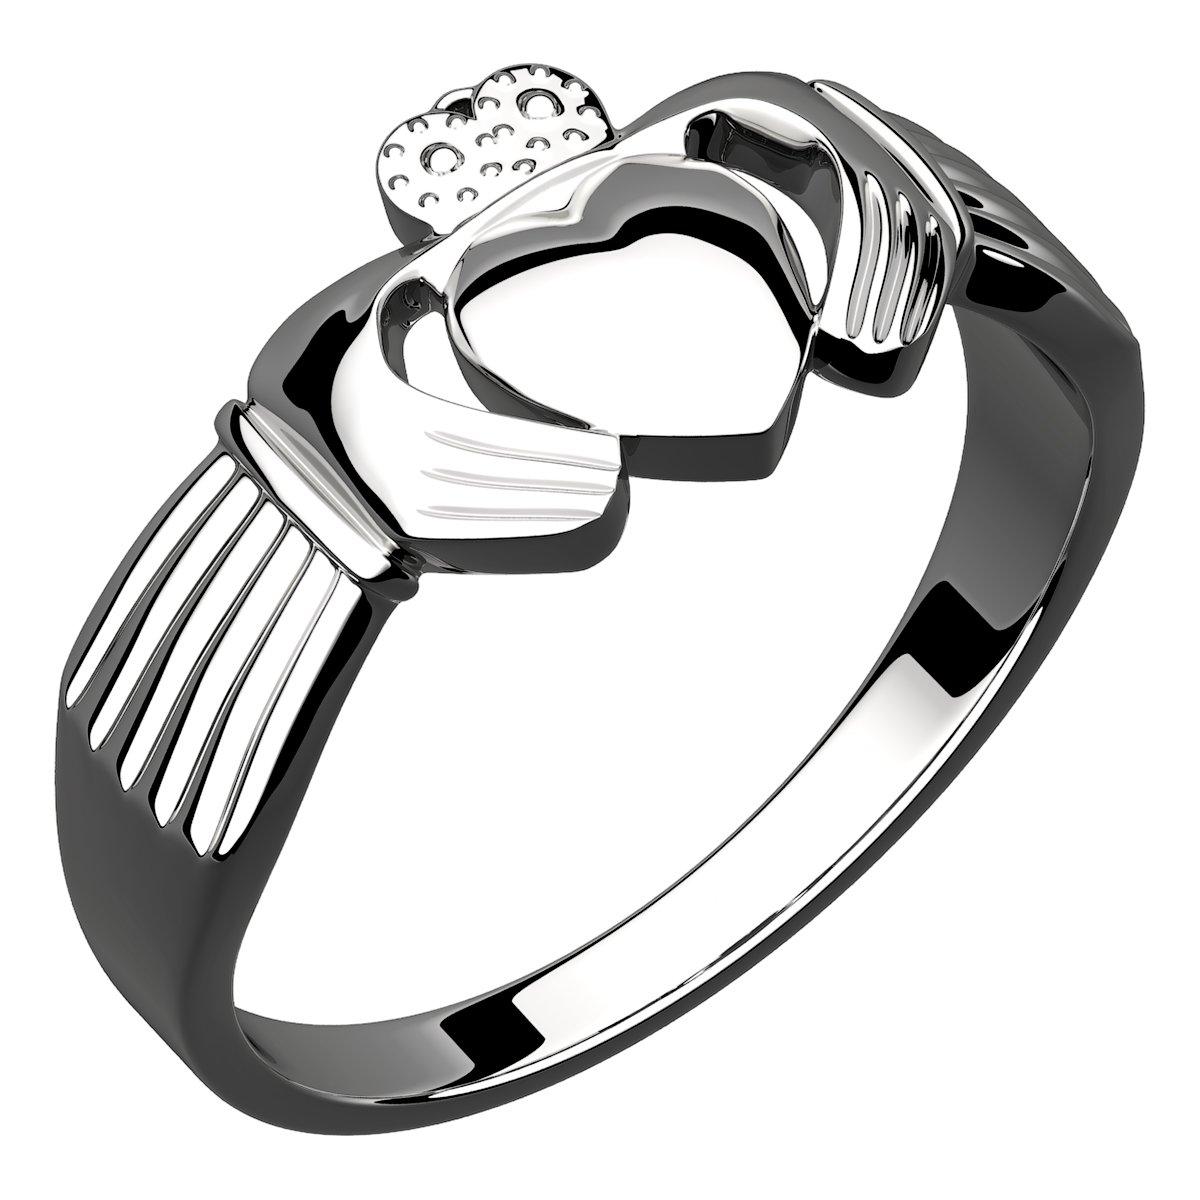 1200x1200 Sterling Silver Irish Claddagh Ring Symbolize Friendship, Love